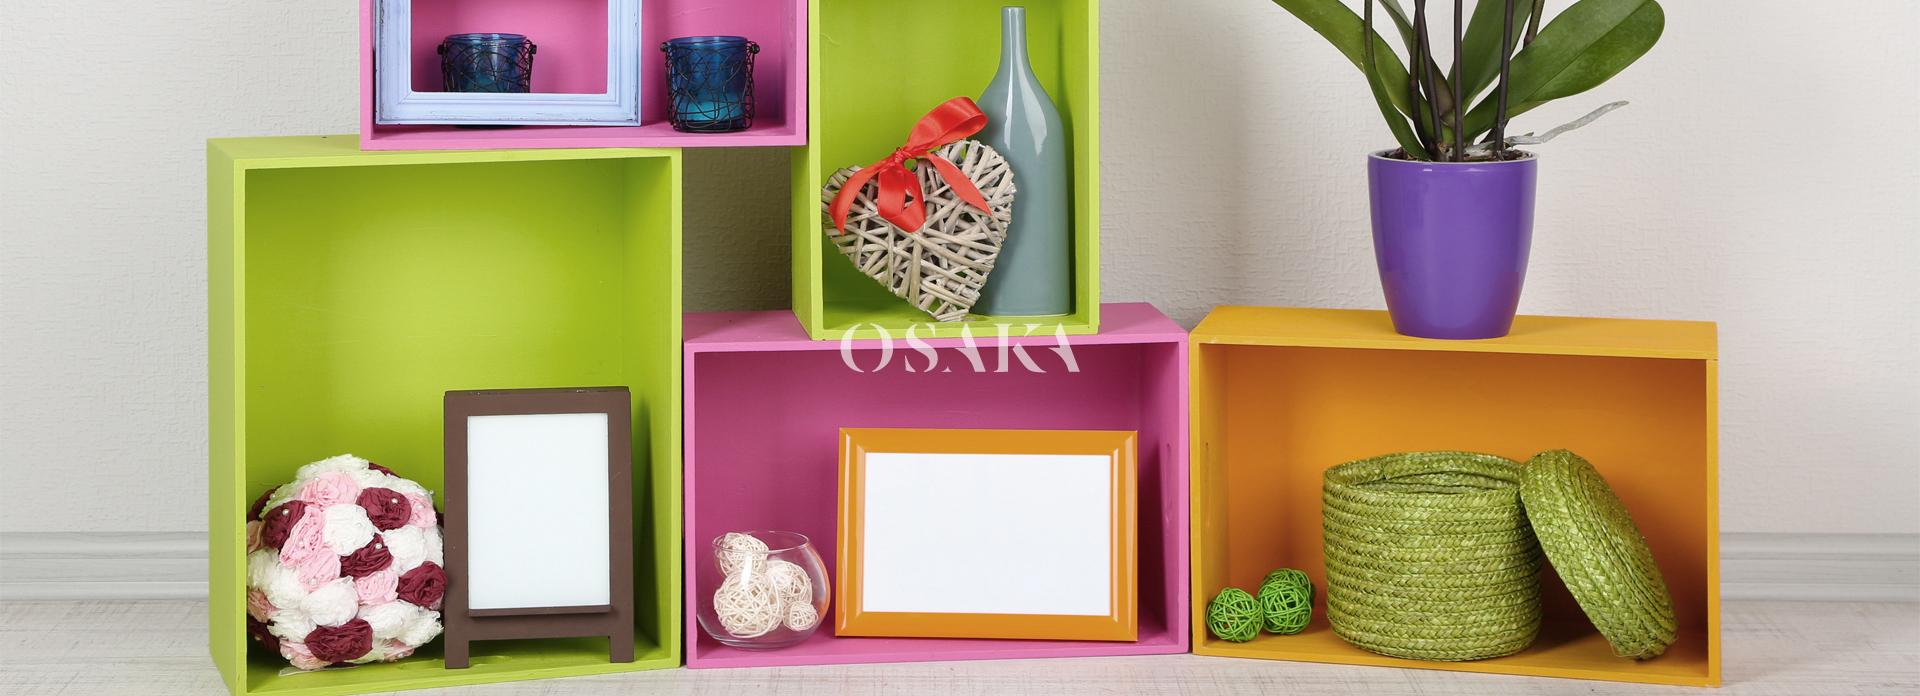 pintura-decorativa-Ultimate